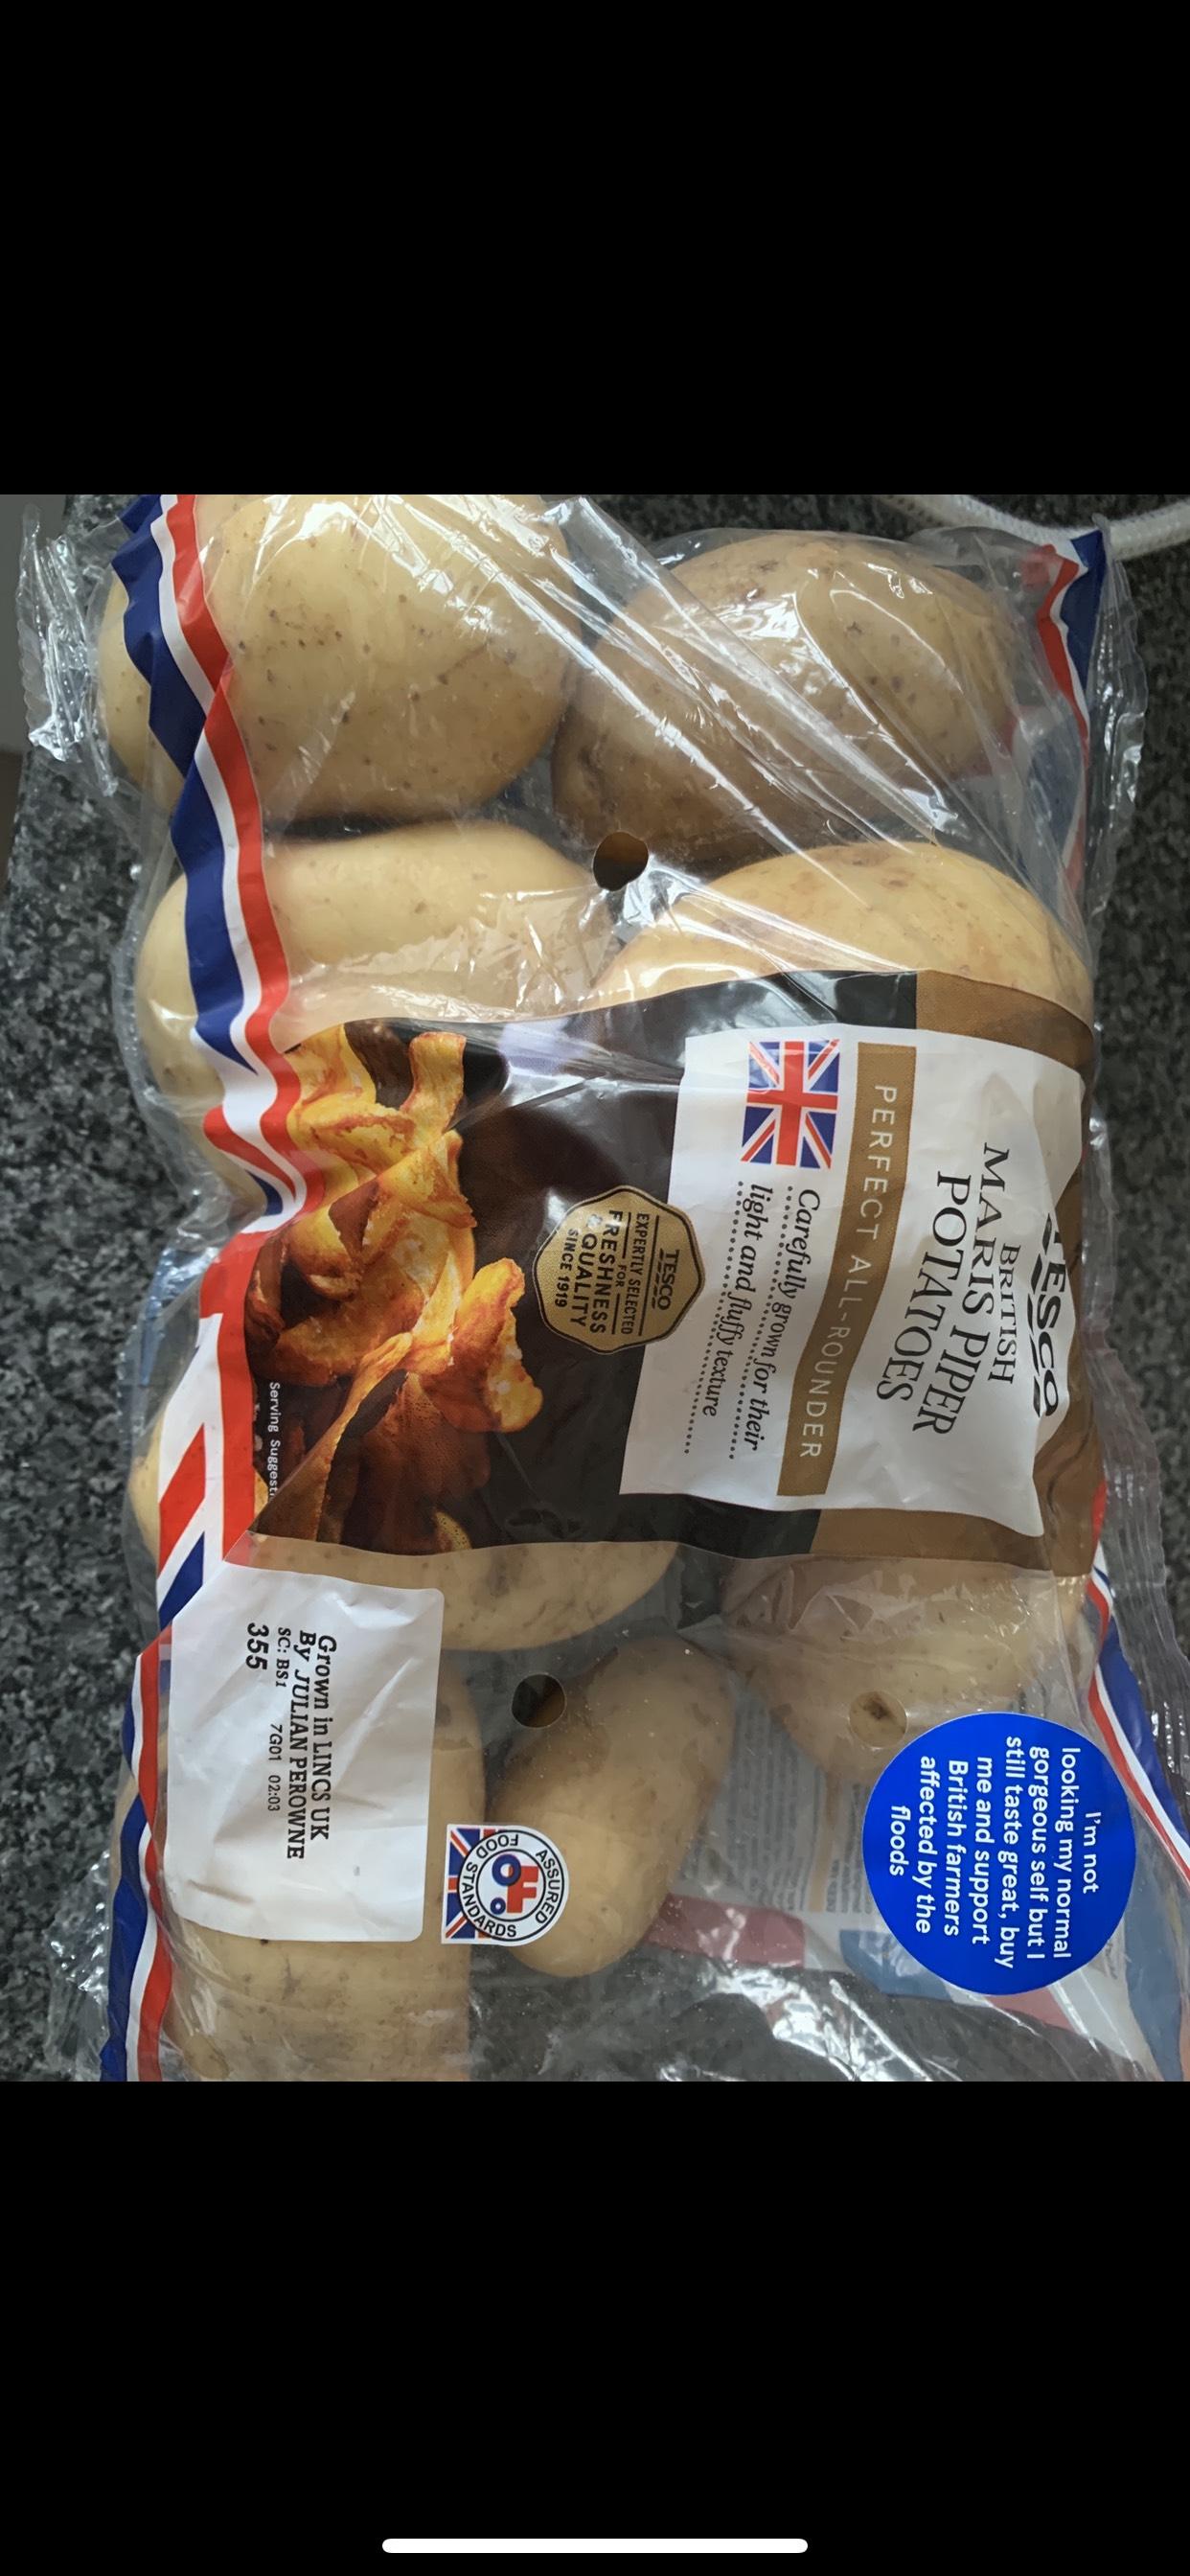 Maris piper potatoes 0.29p @tesco express